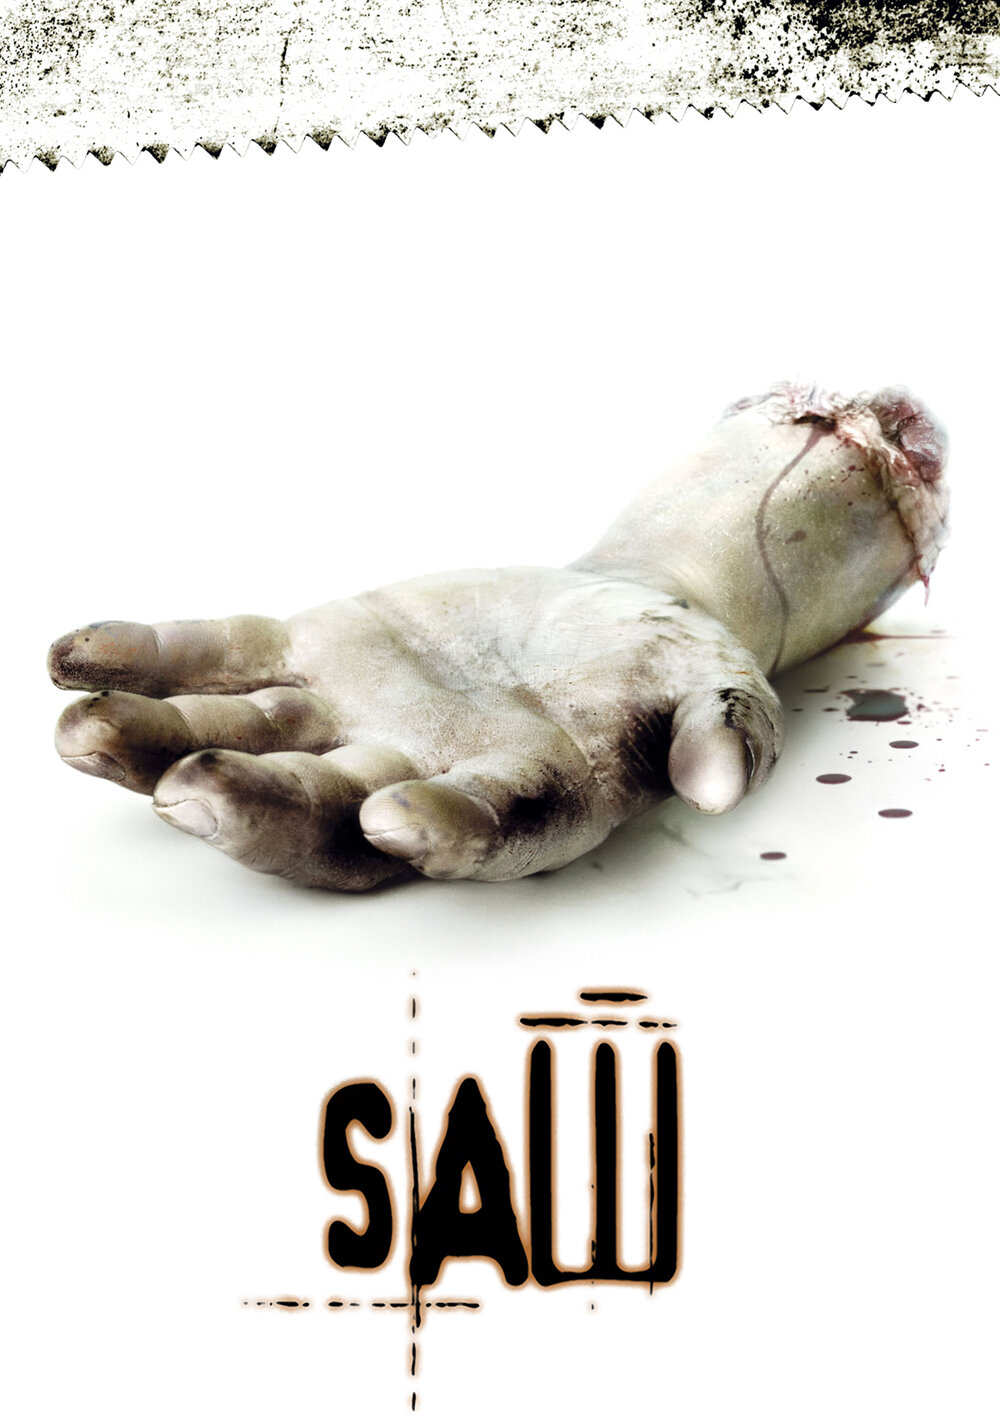 saw-movie-poster.jpg